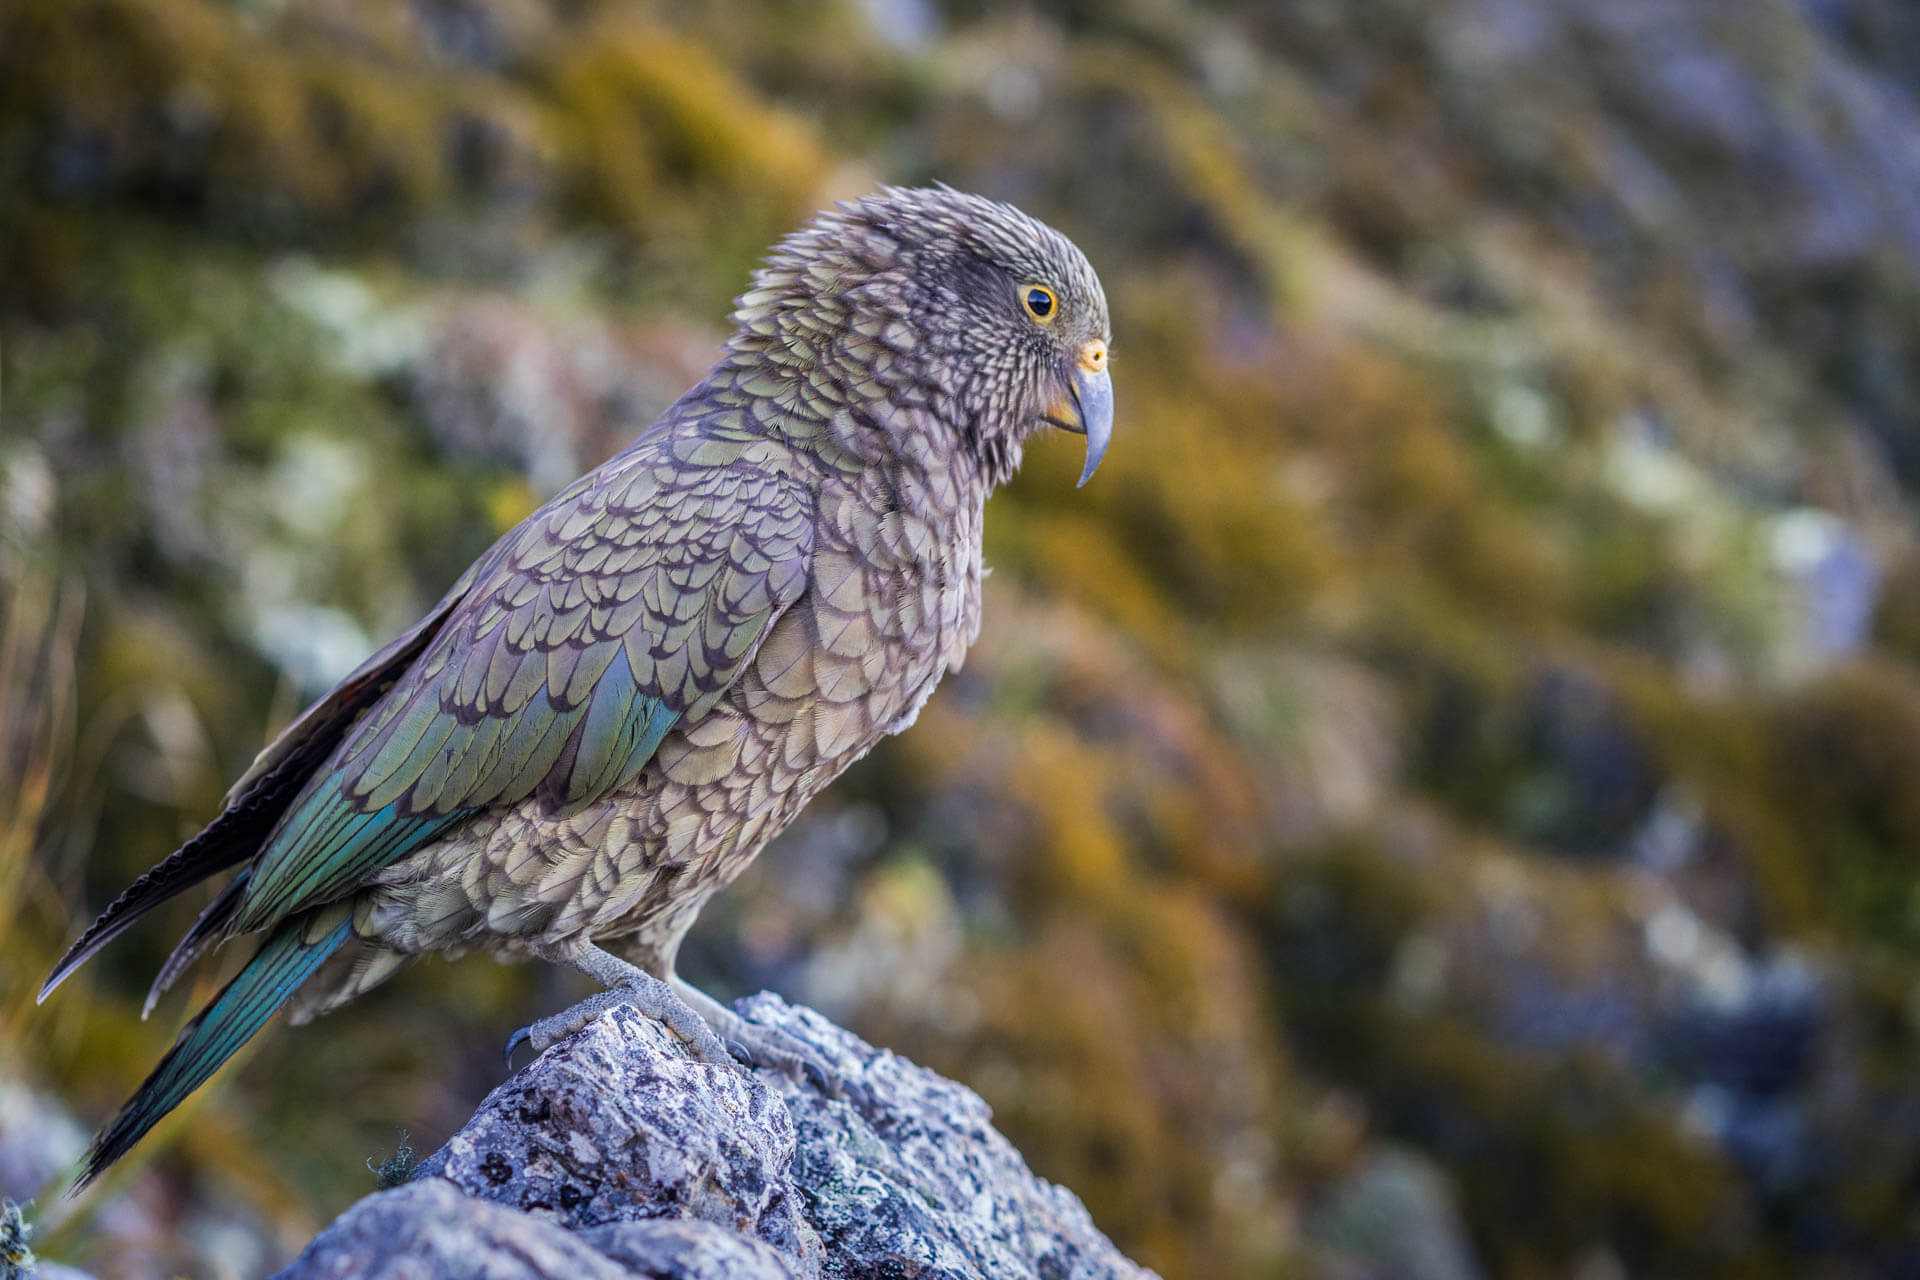 Oiseau perroquet, Nestor Kéa